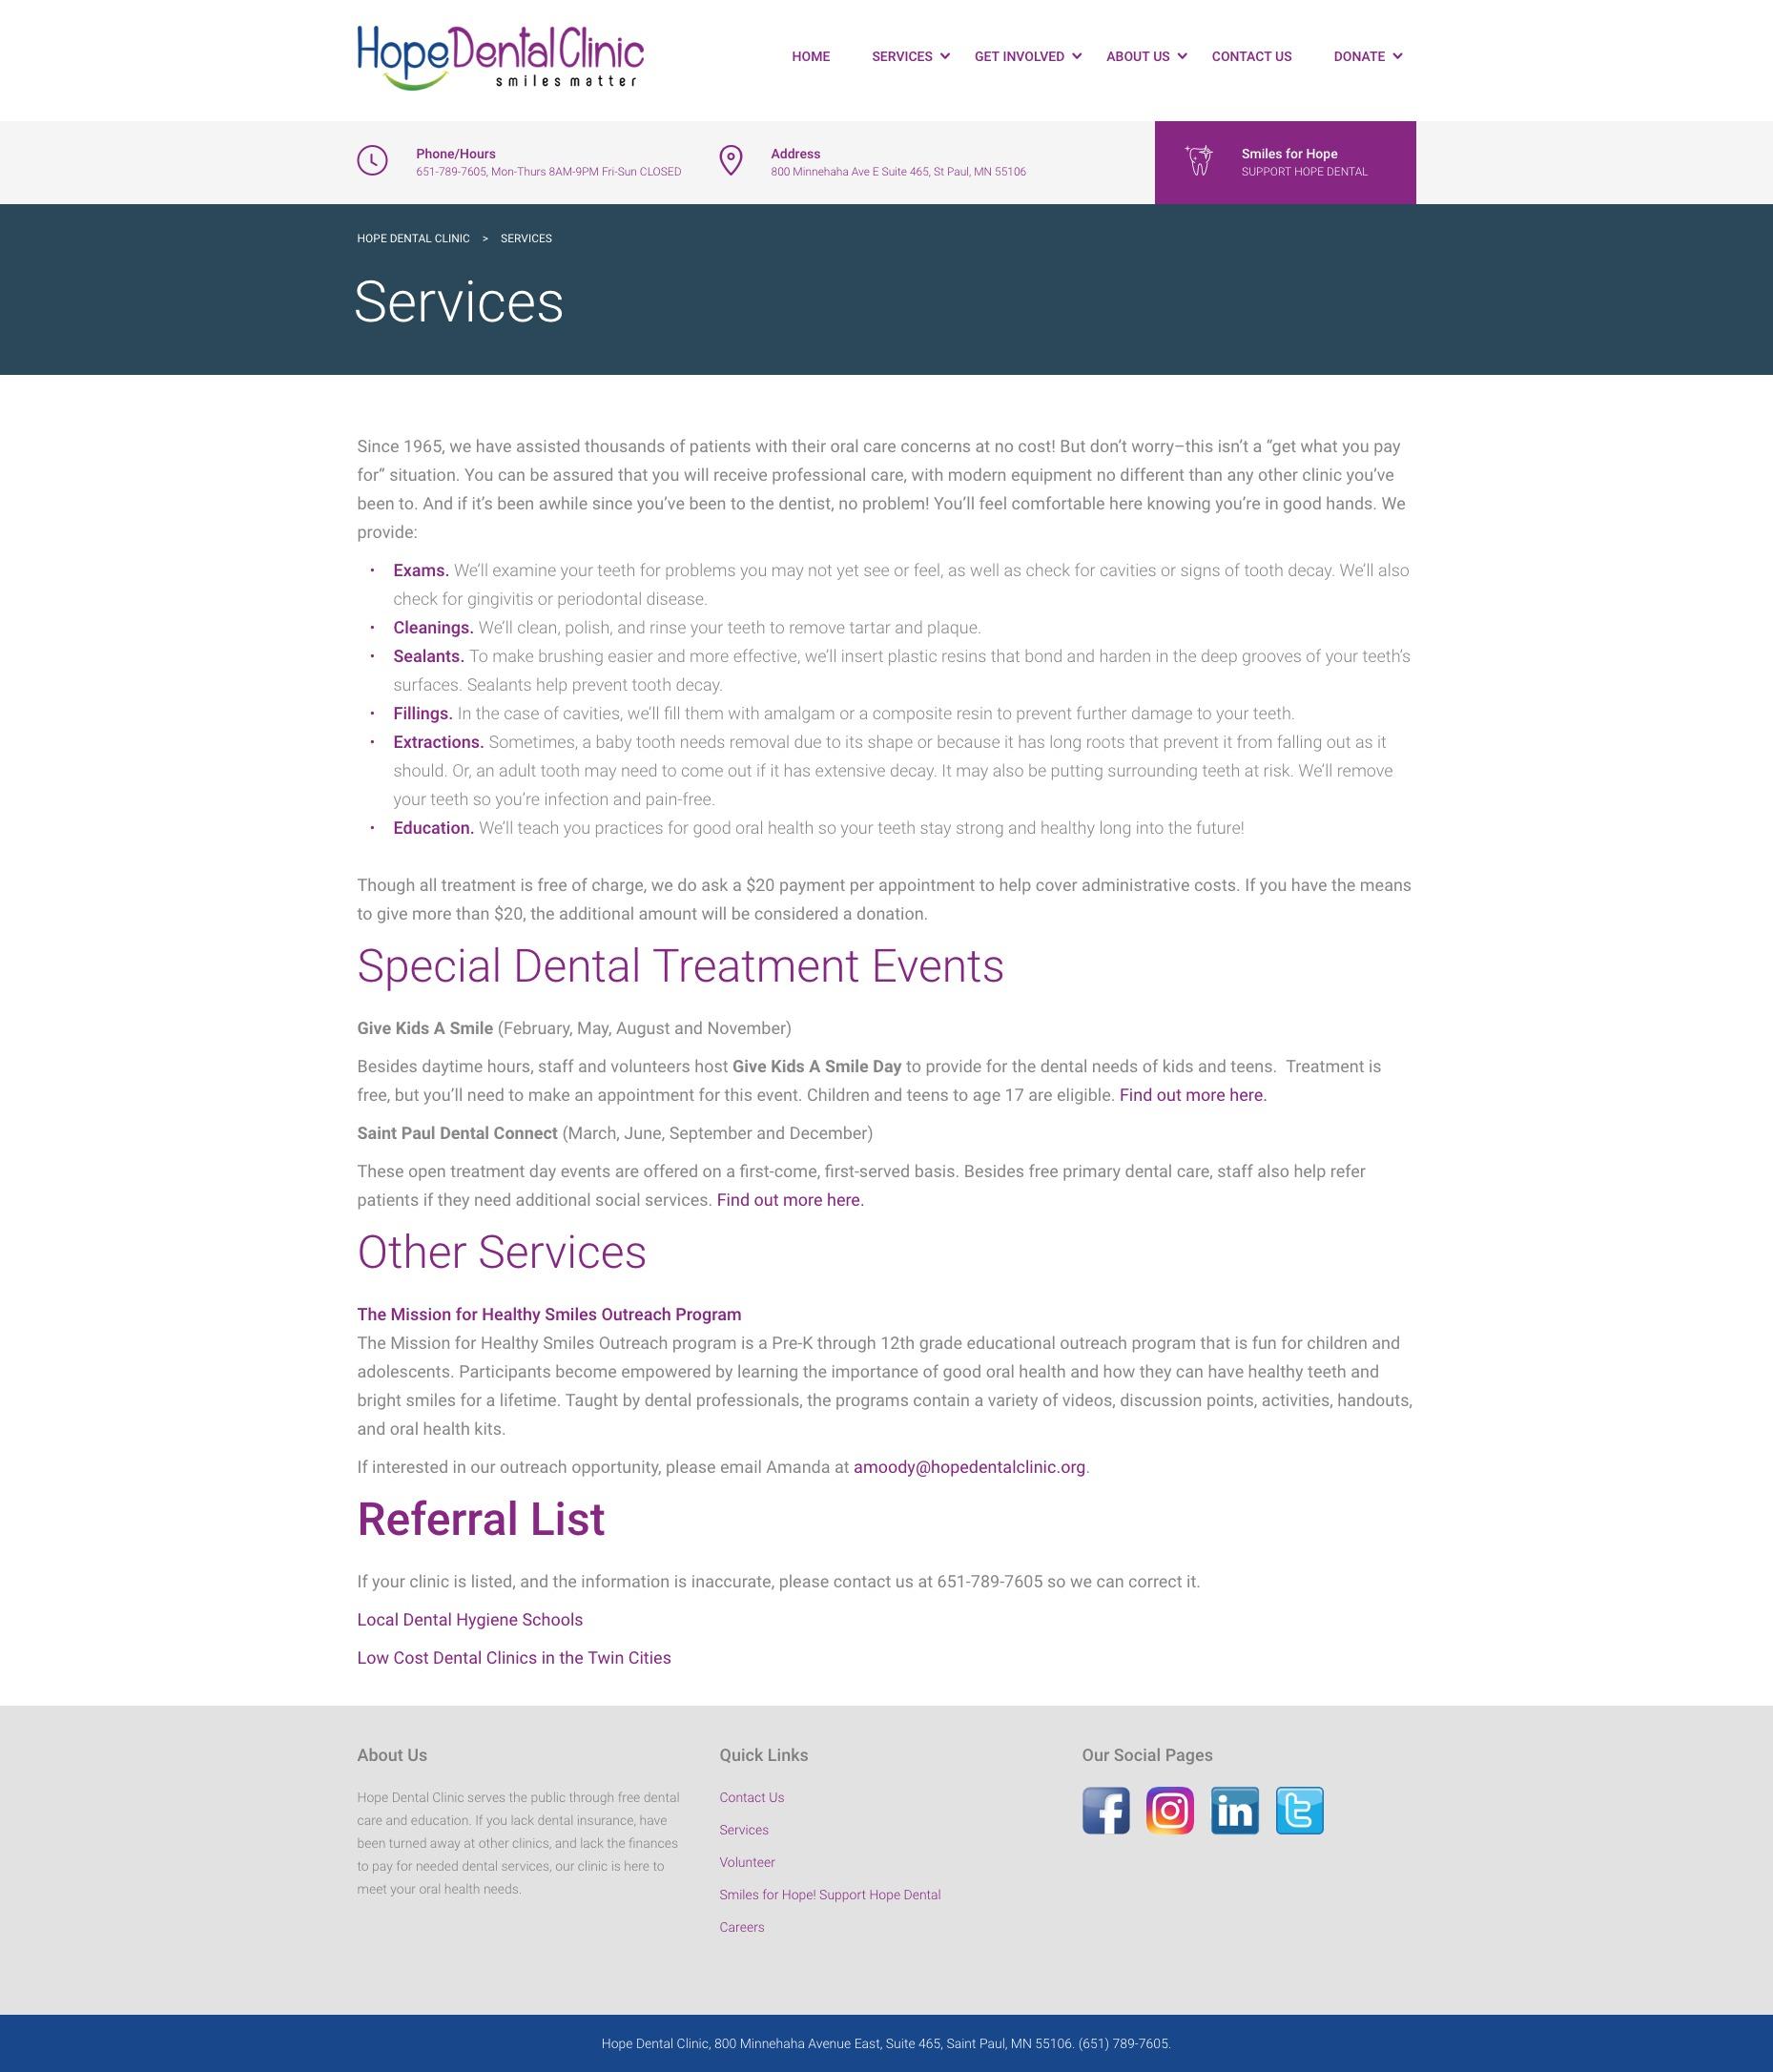 screencapture-hopedentalclinic-org-services-2019-01-17-21_00_35.jpg